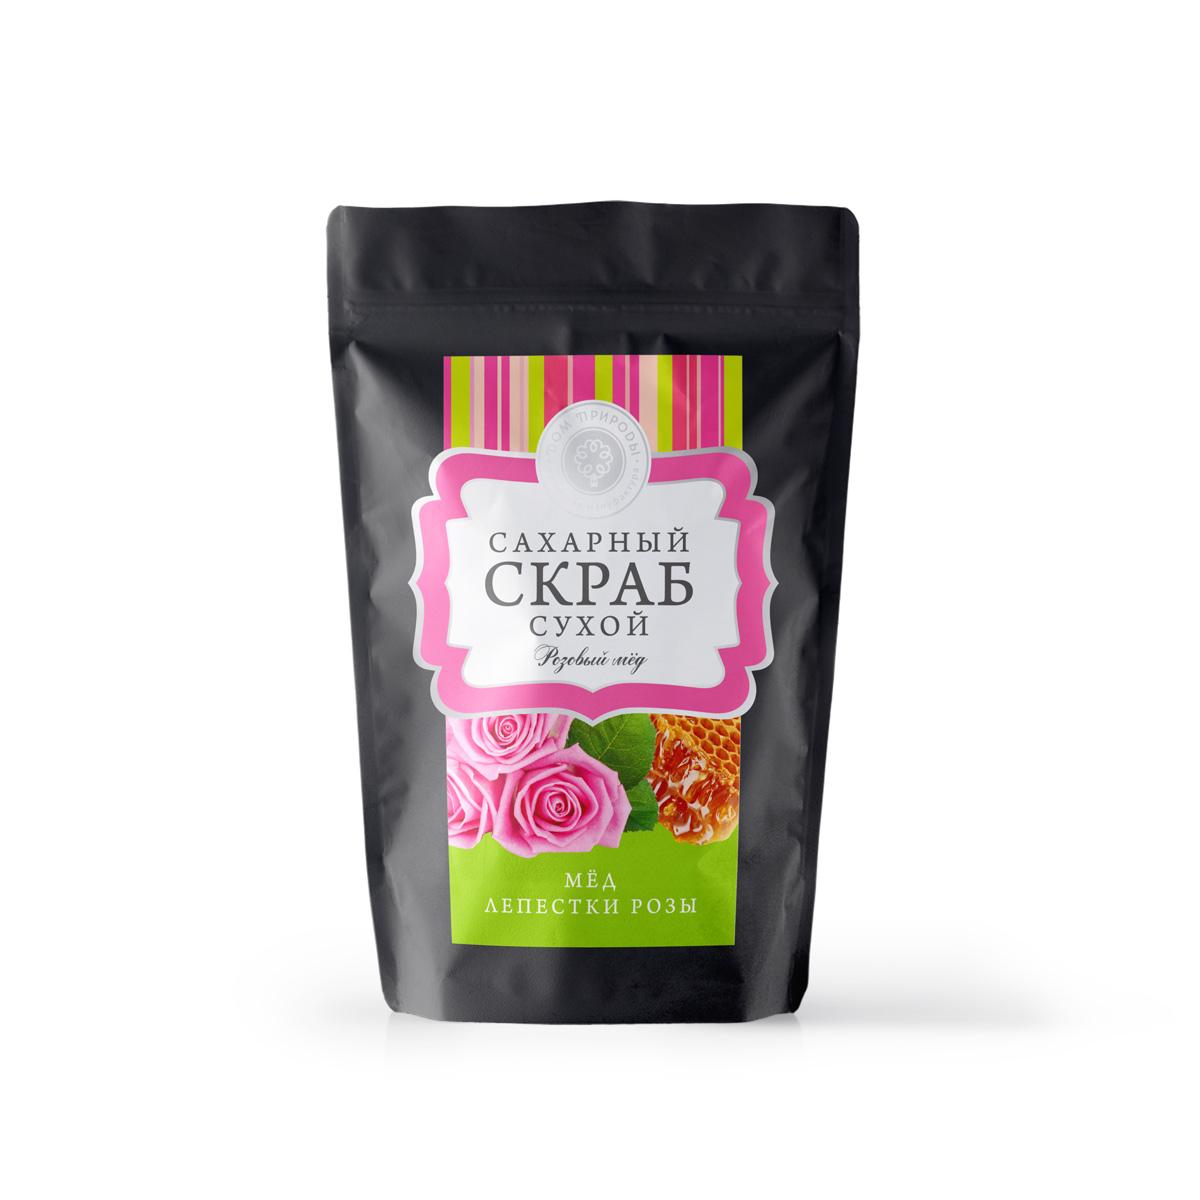 "Сухой сахарный скраб для тела ""Розовый мед"" 250 гр."